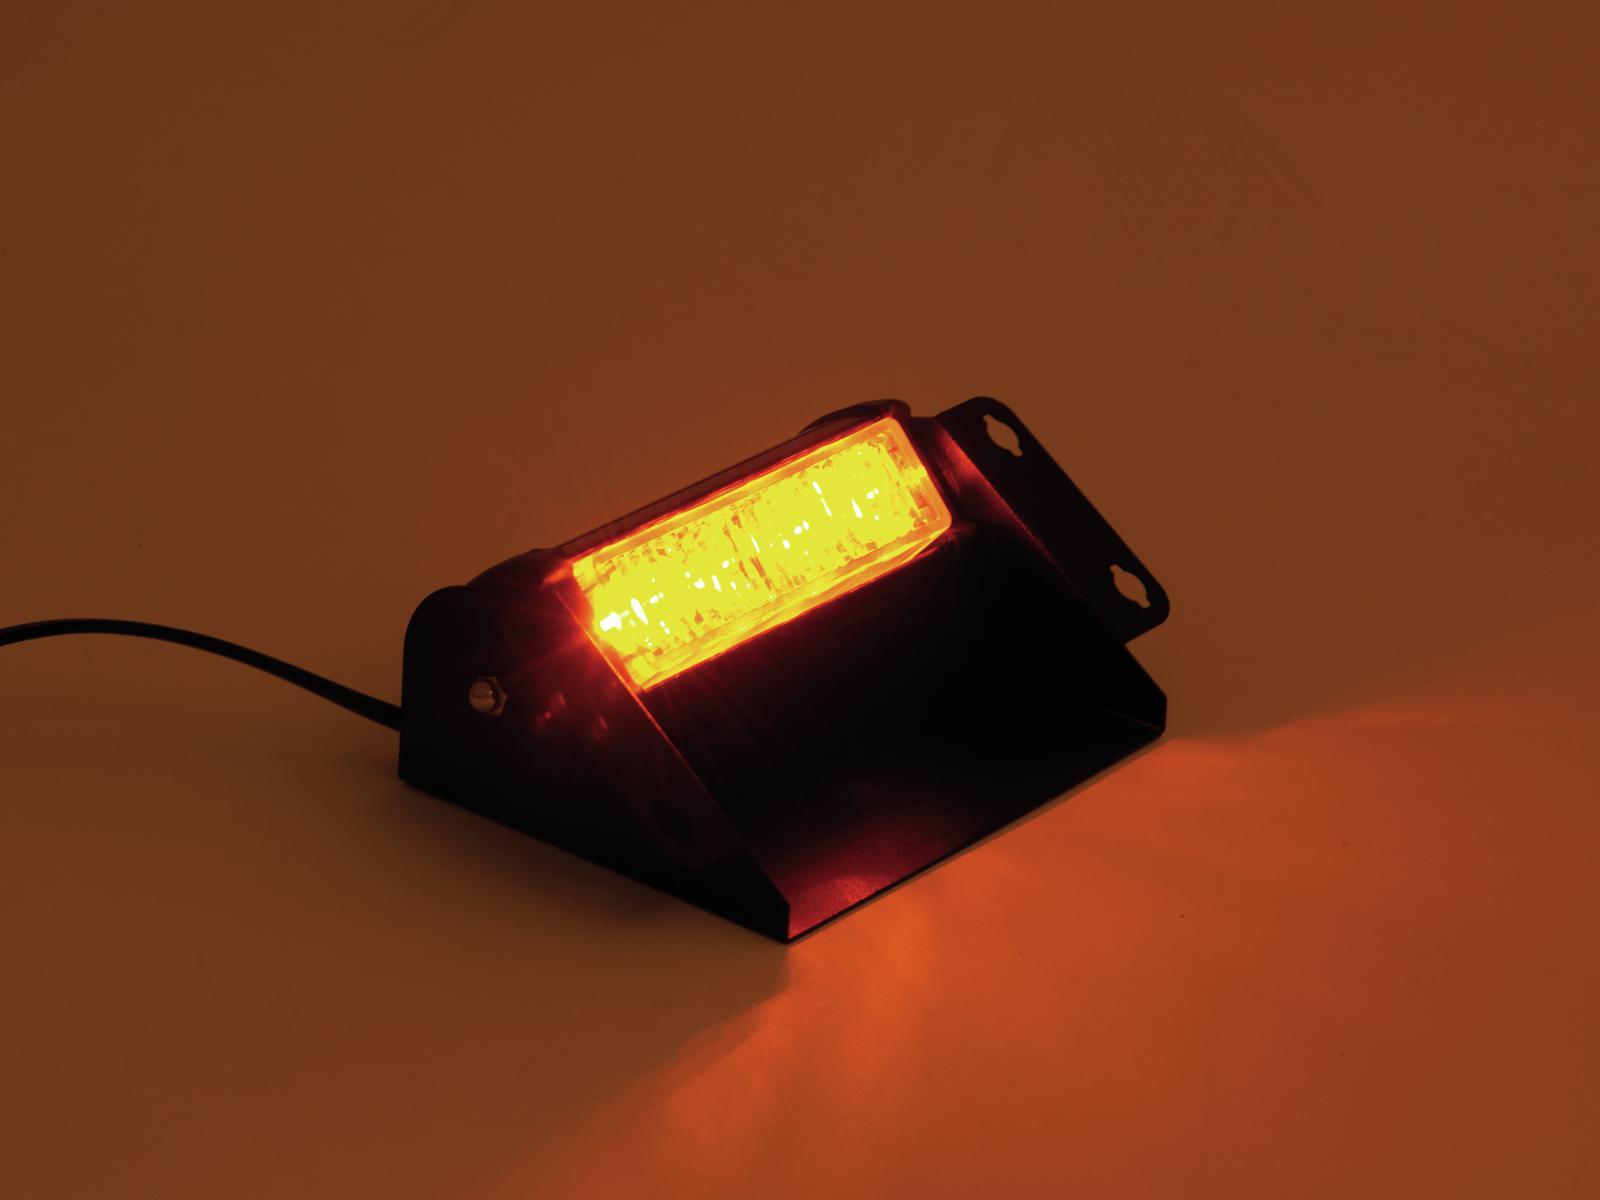 EUROLITE LED di Polizia Light PRO 12V ambra ad Alta Potenza